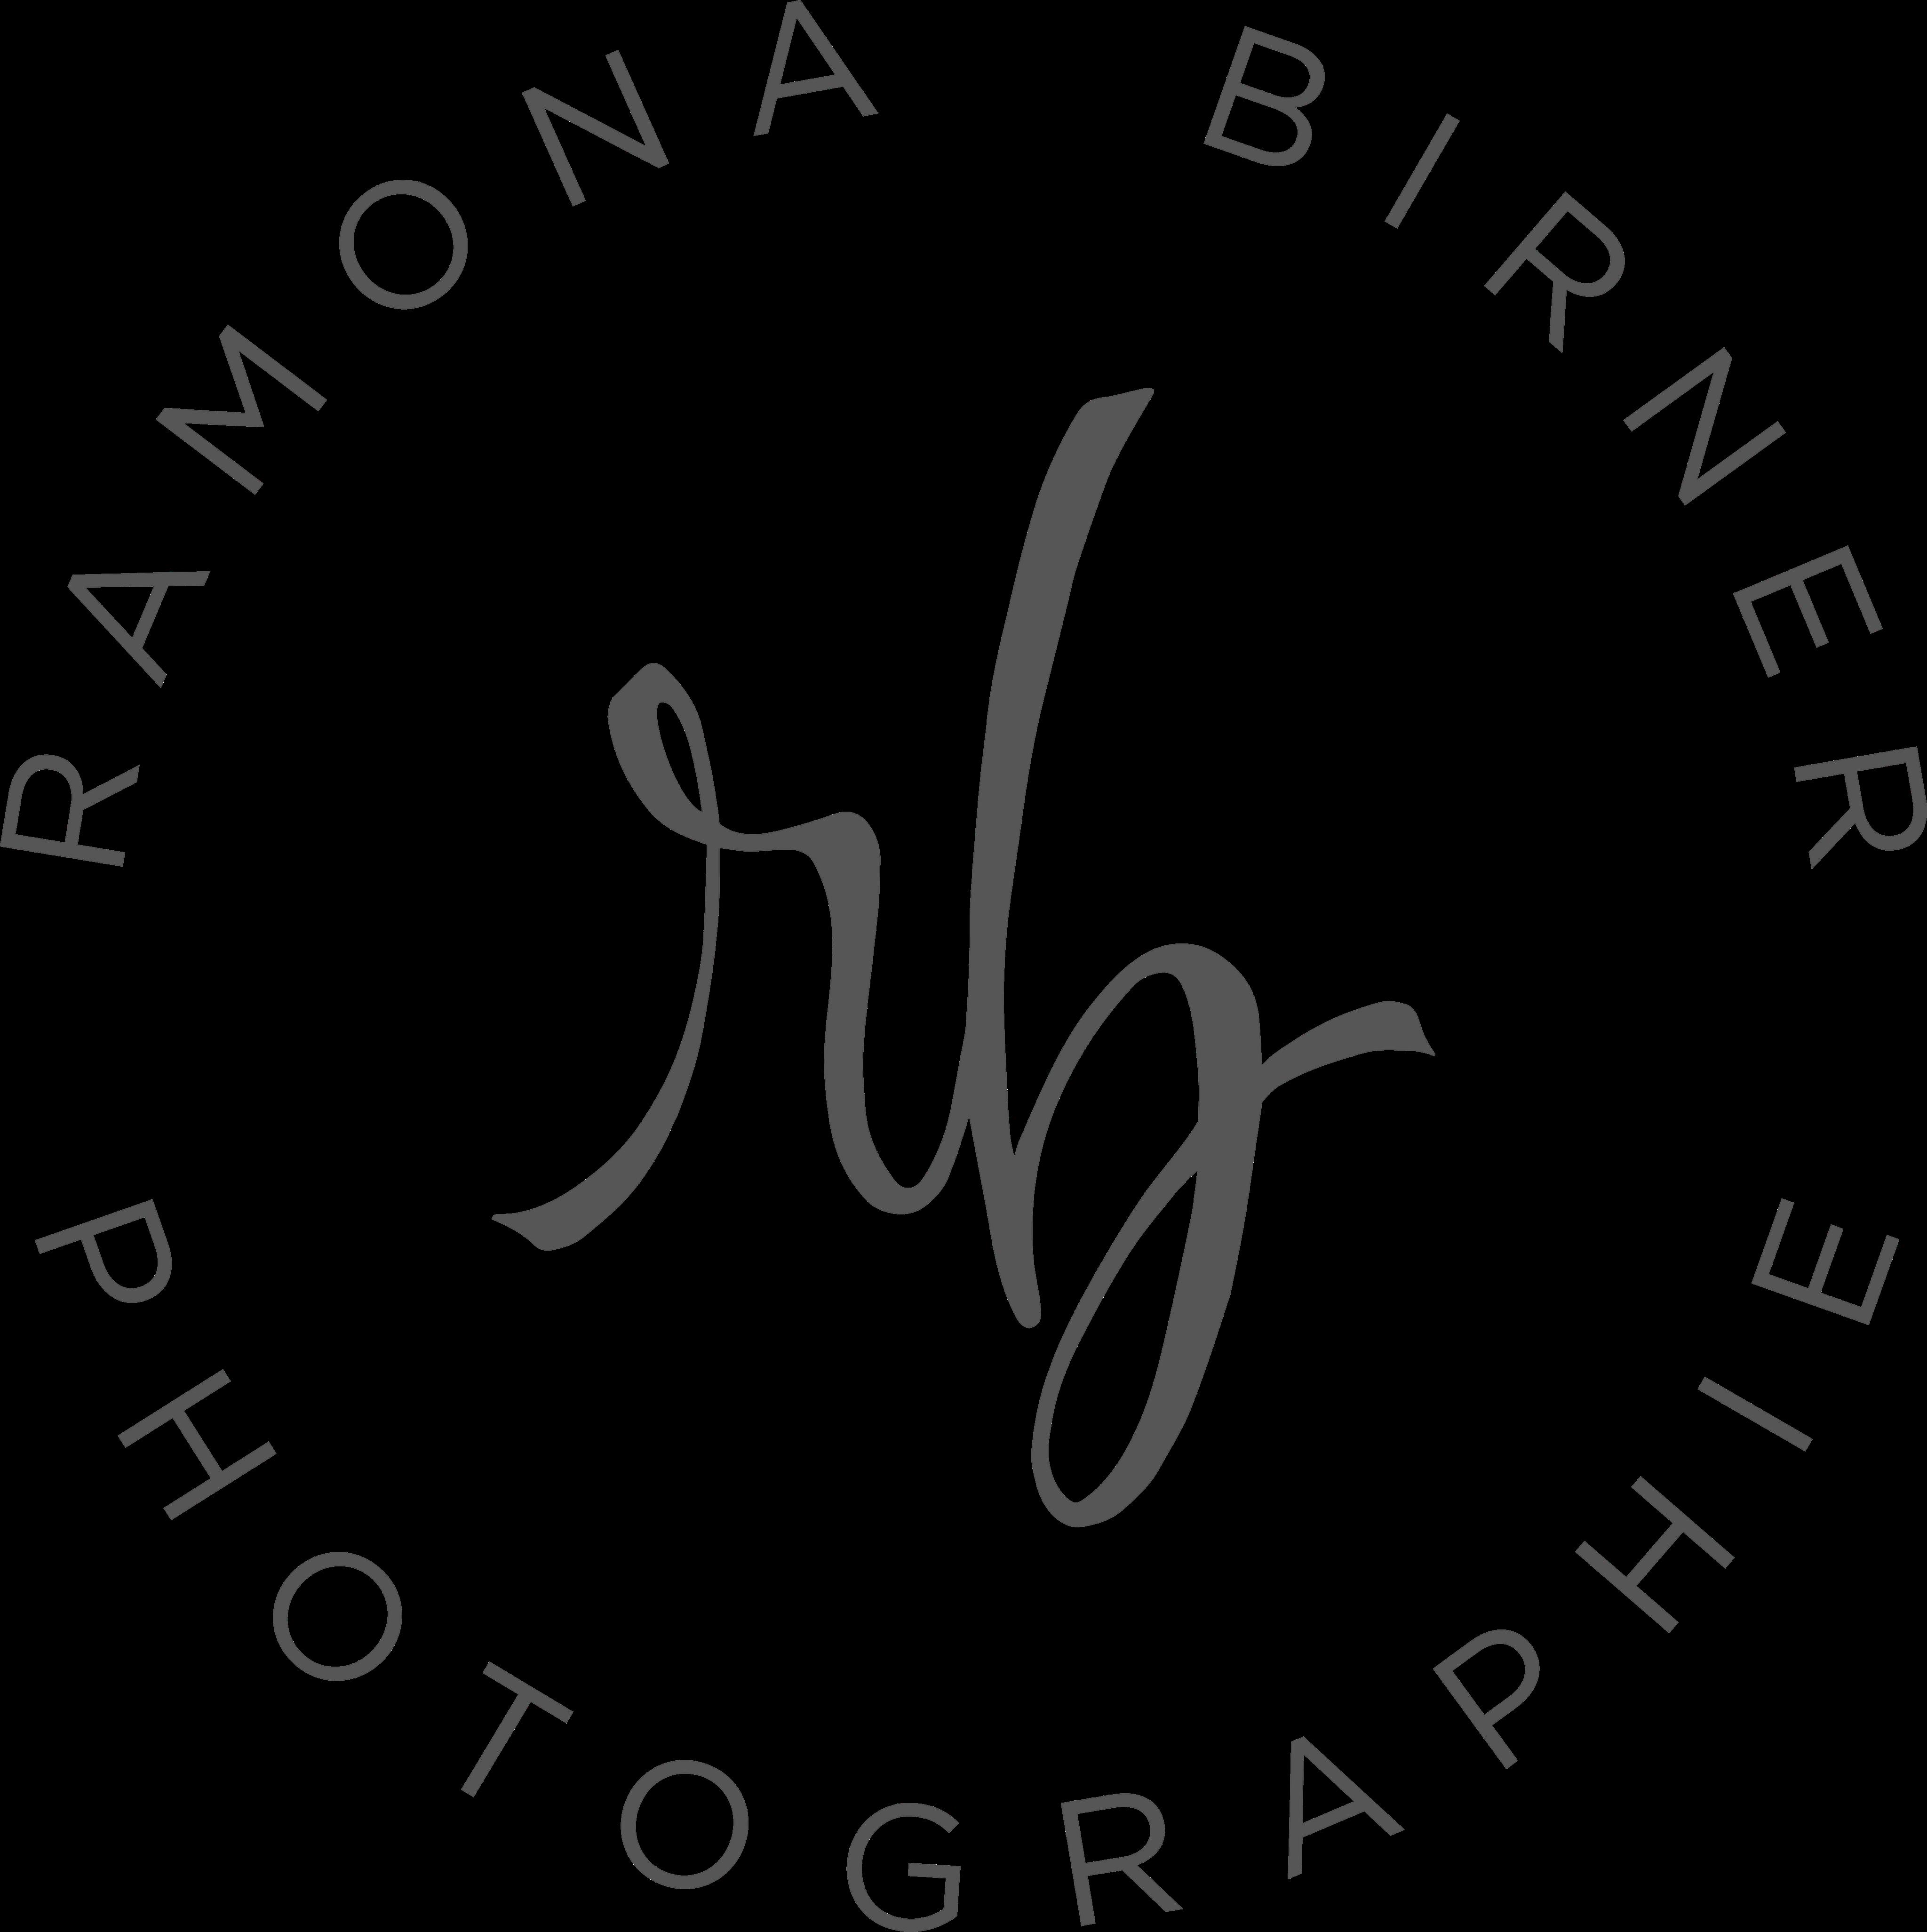 Ramona Birner Photographie